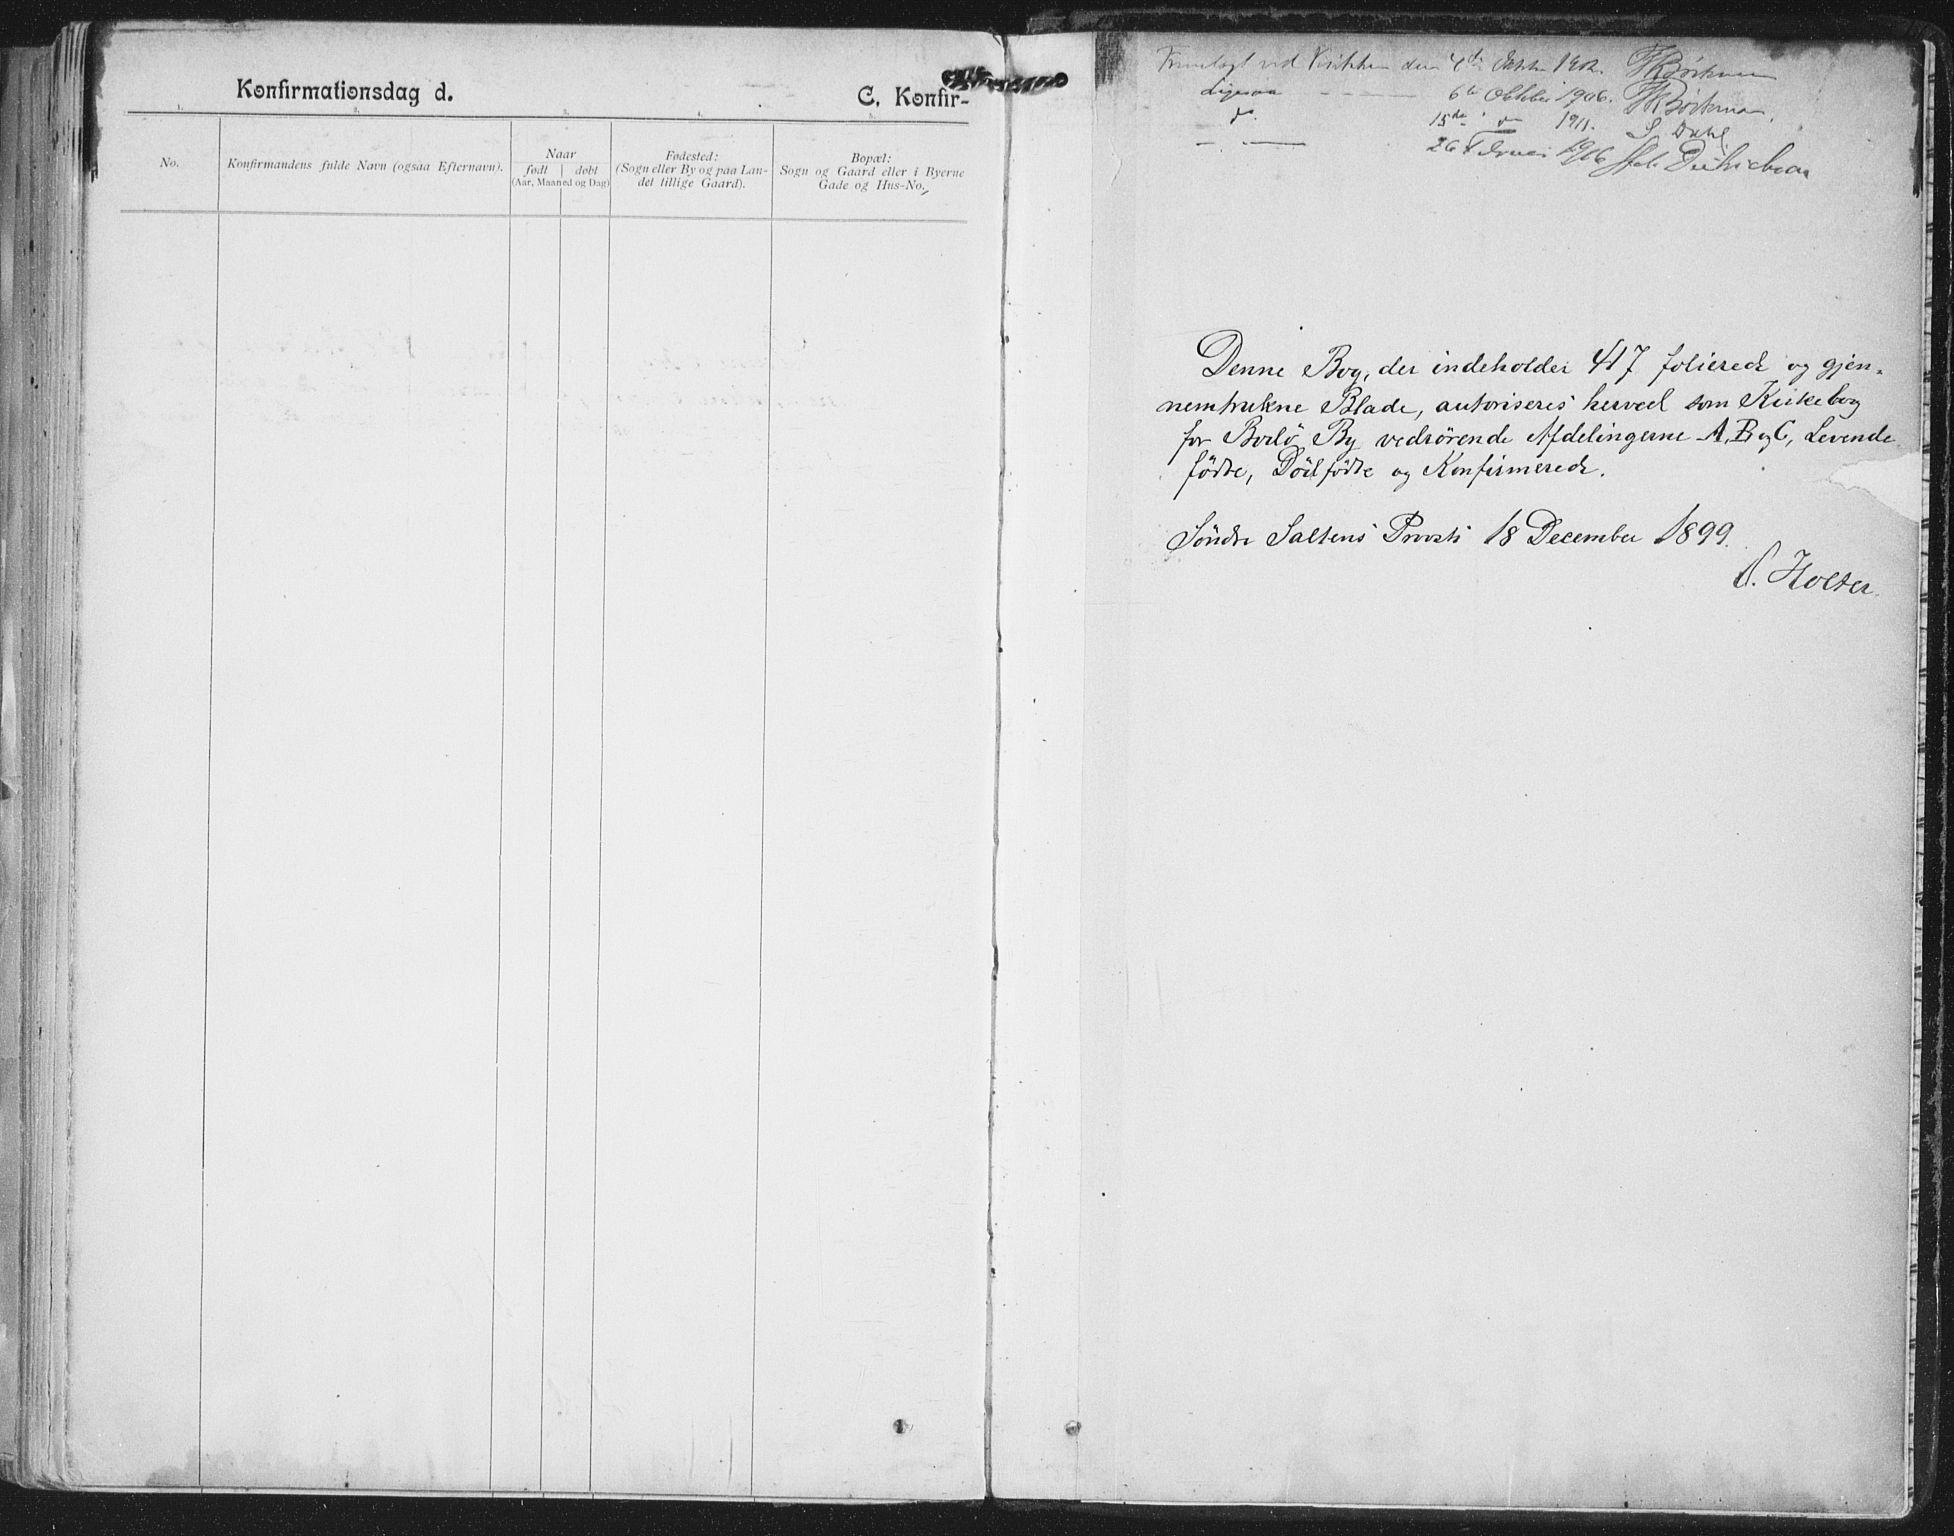 SAT, Ministerialprotokoller, klokkerbøker og fødselsregistre - Nordland, 801/L0011: Ministerialbok nr. 801A11, 1900-1916